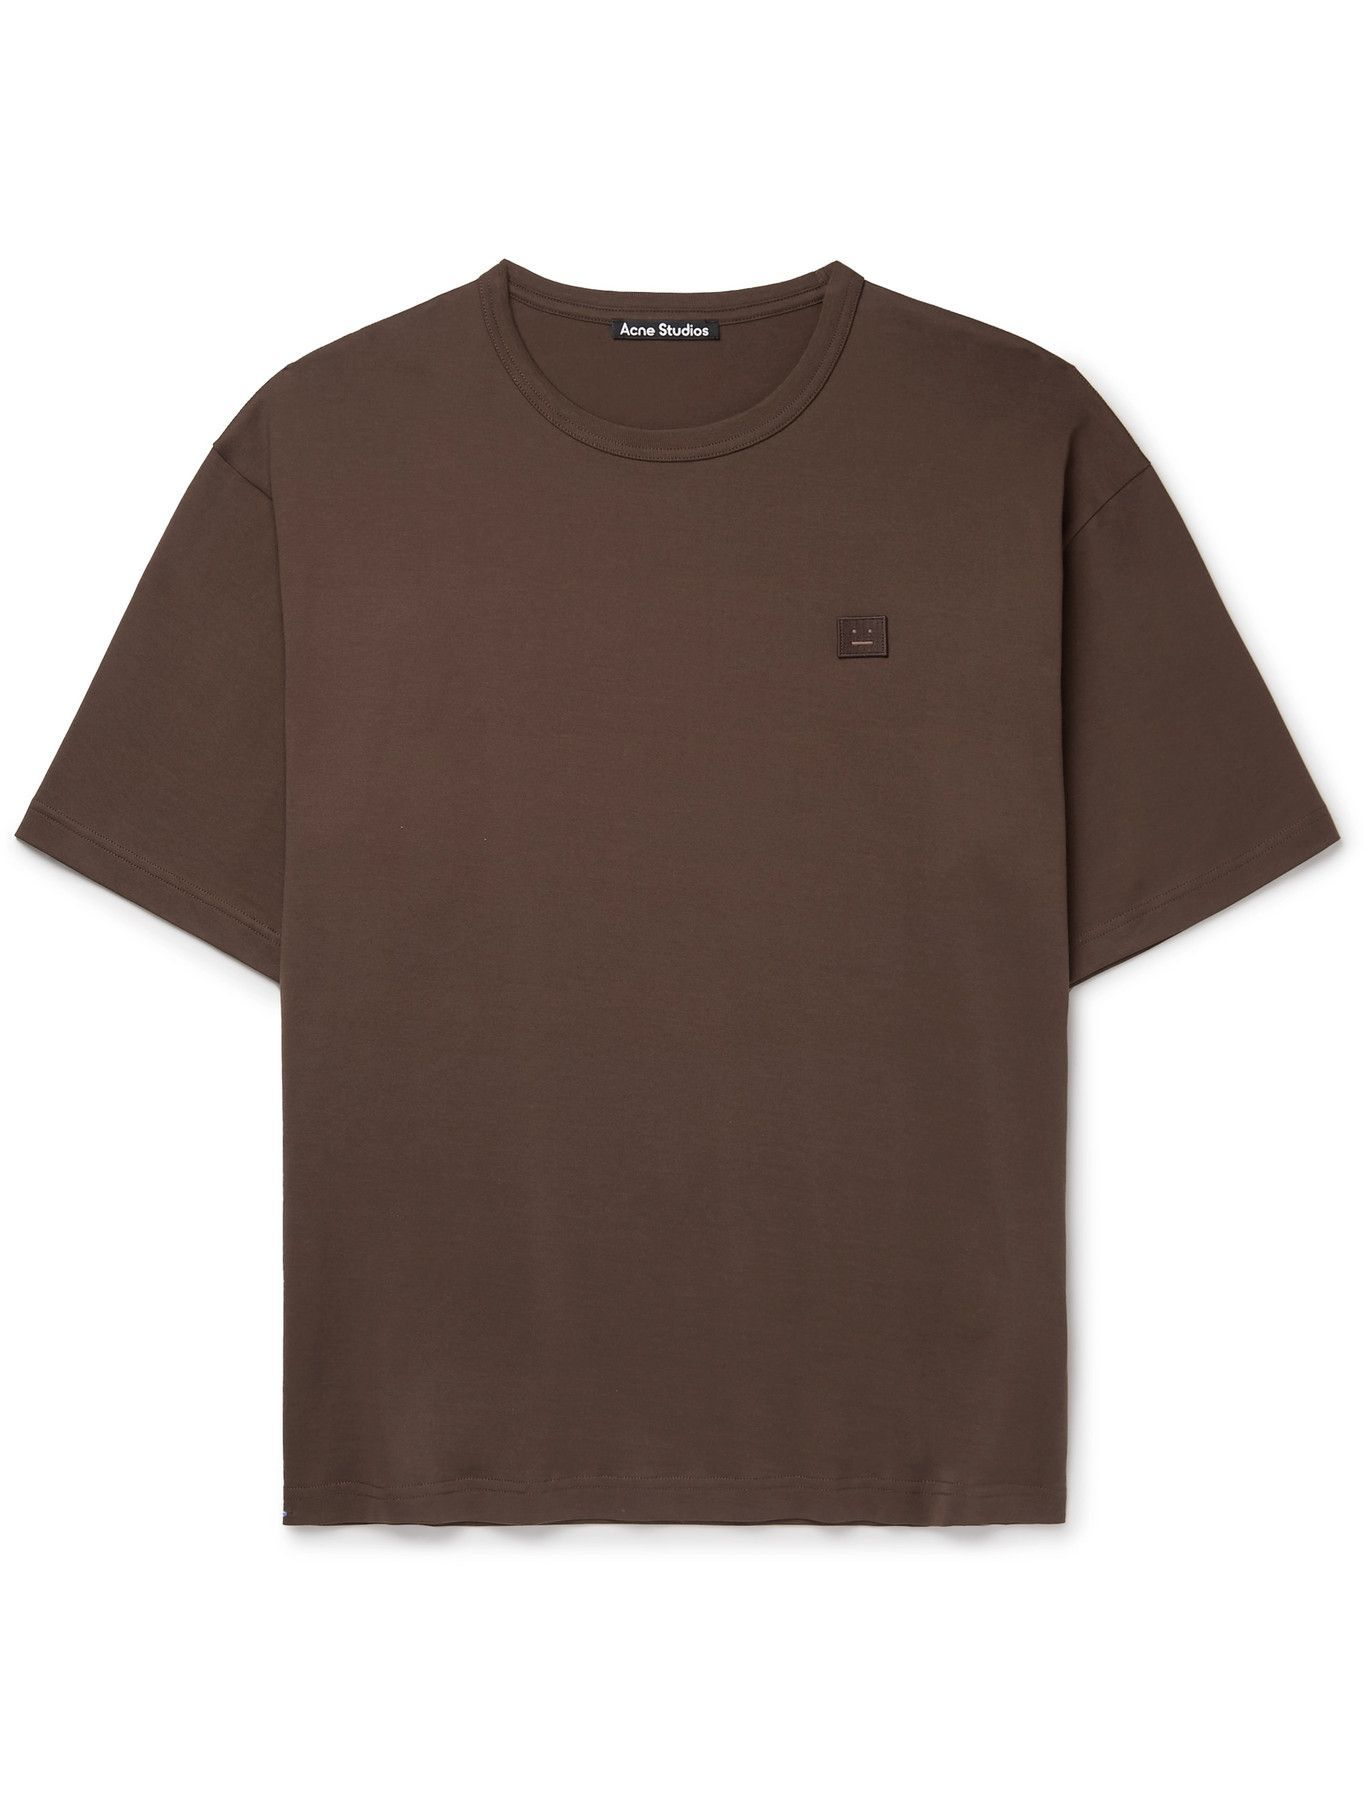 Photo: ACNE STUDIOS - Exford Oversized Logo-Appliquéd Cotton-Jersey T-Shirt - Brown